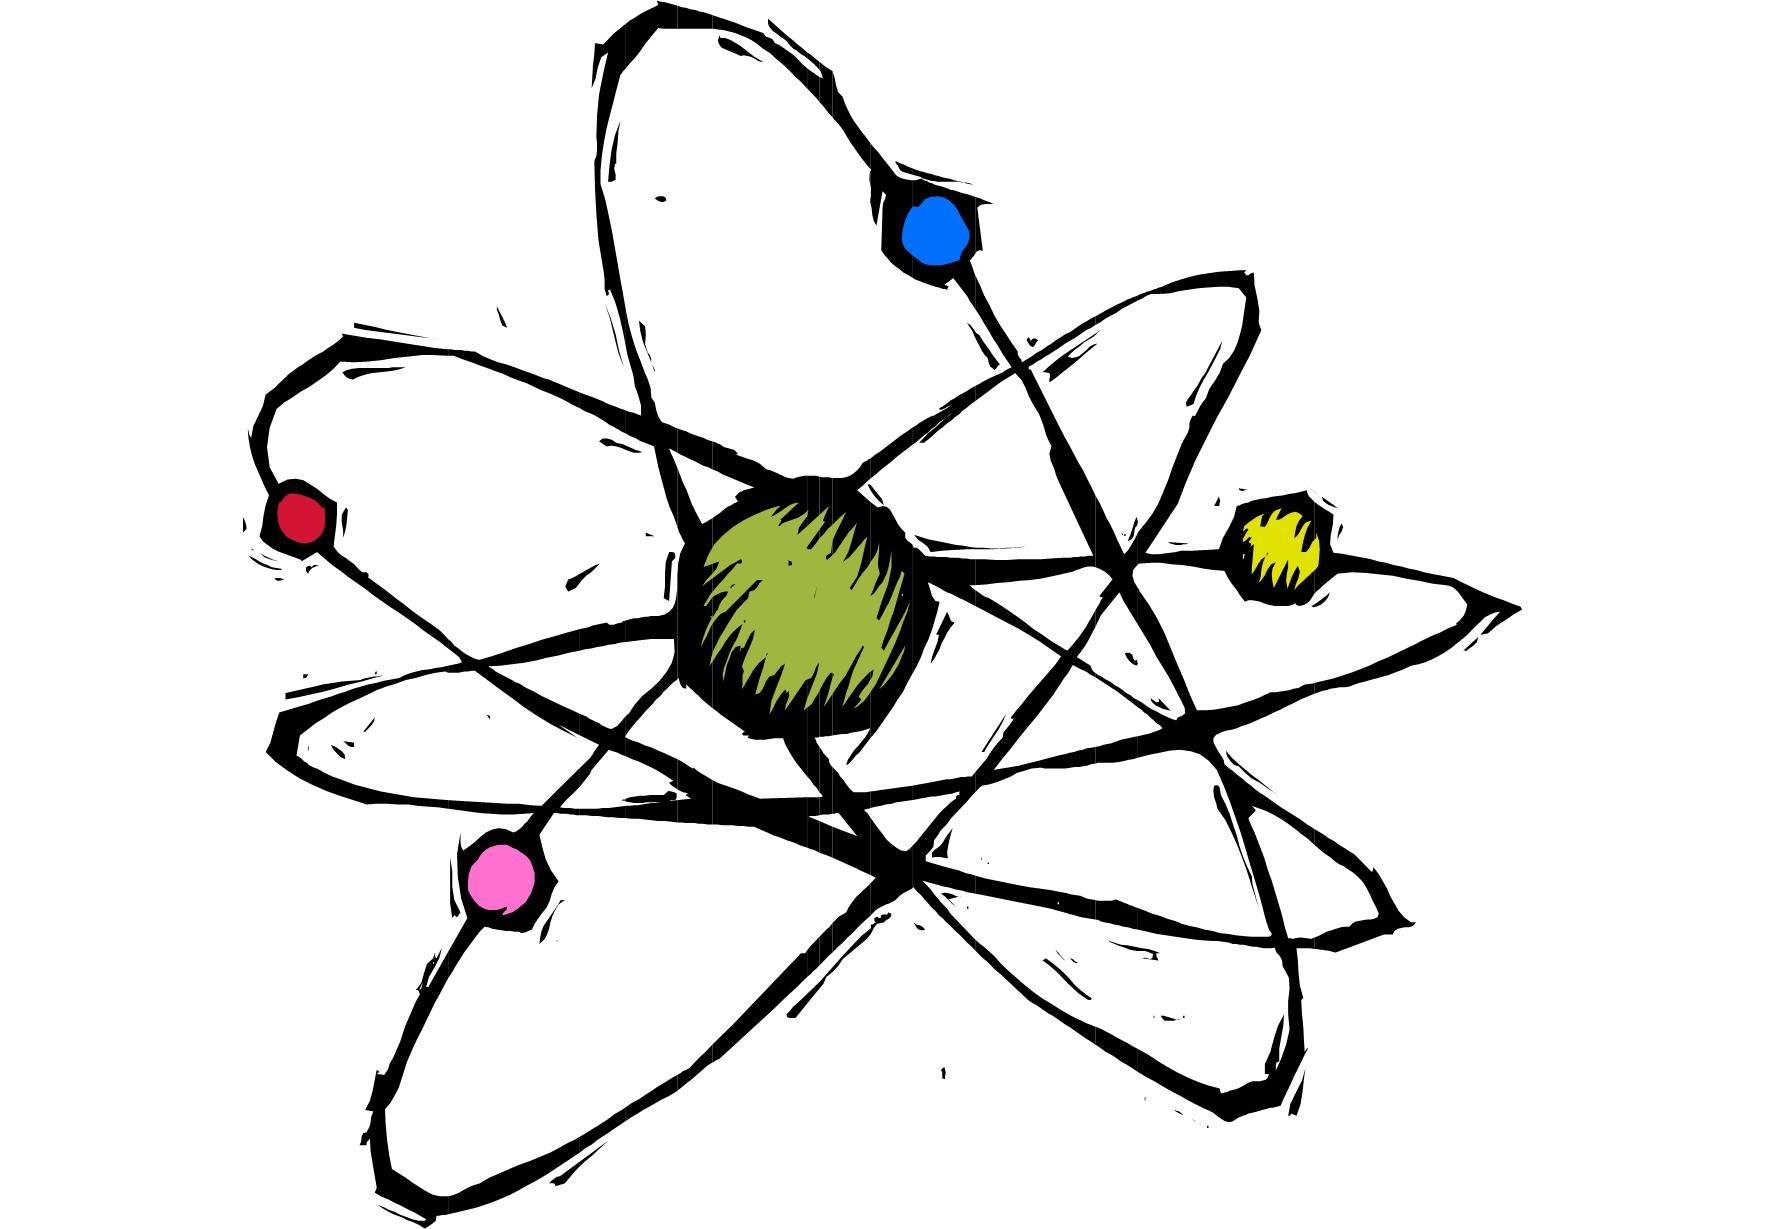 Atom.